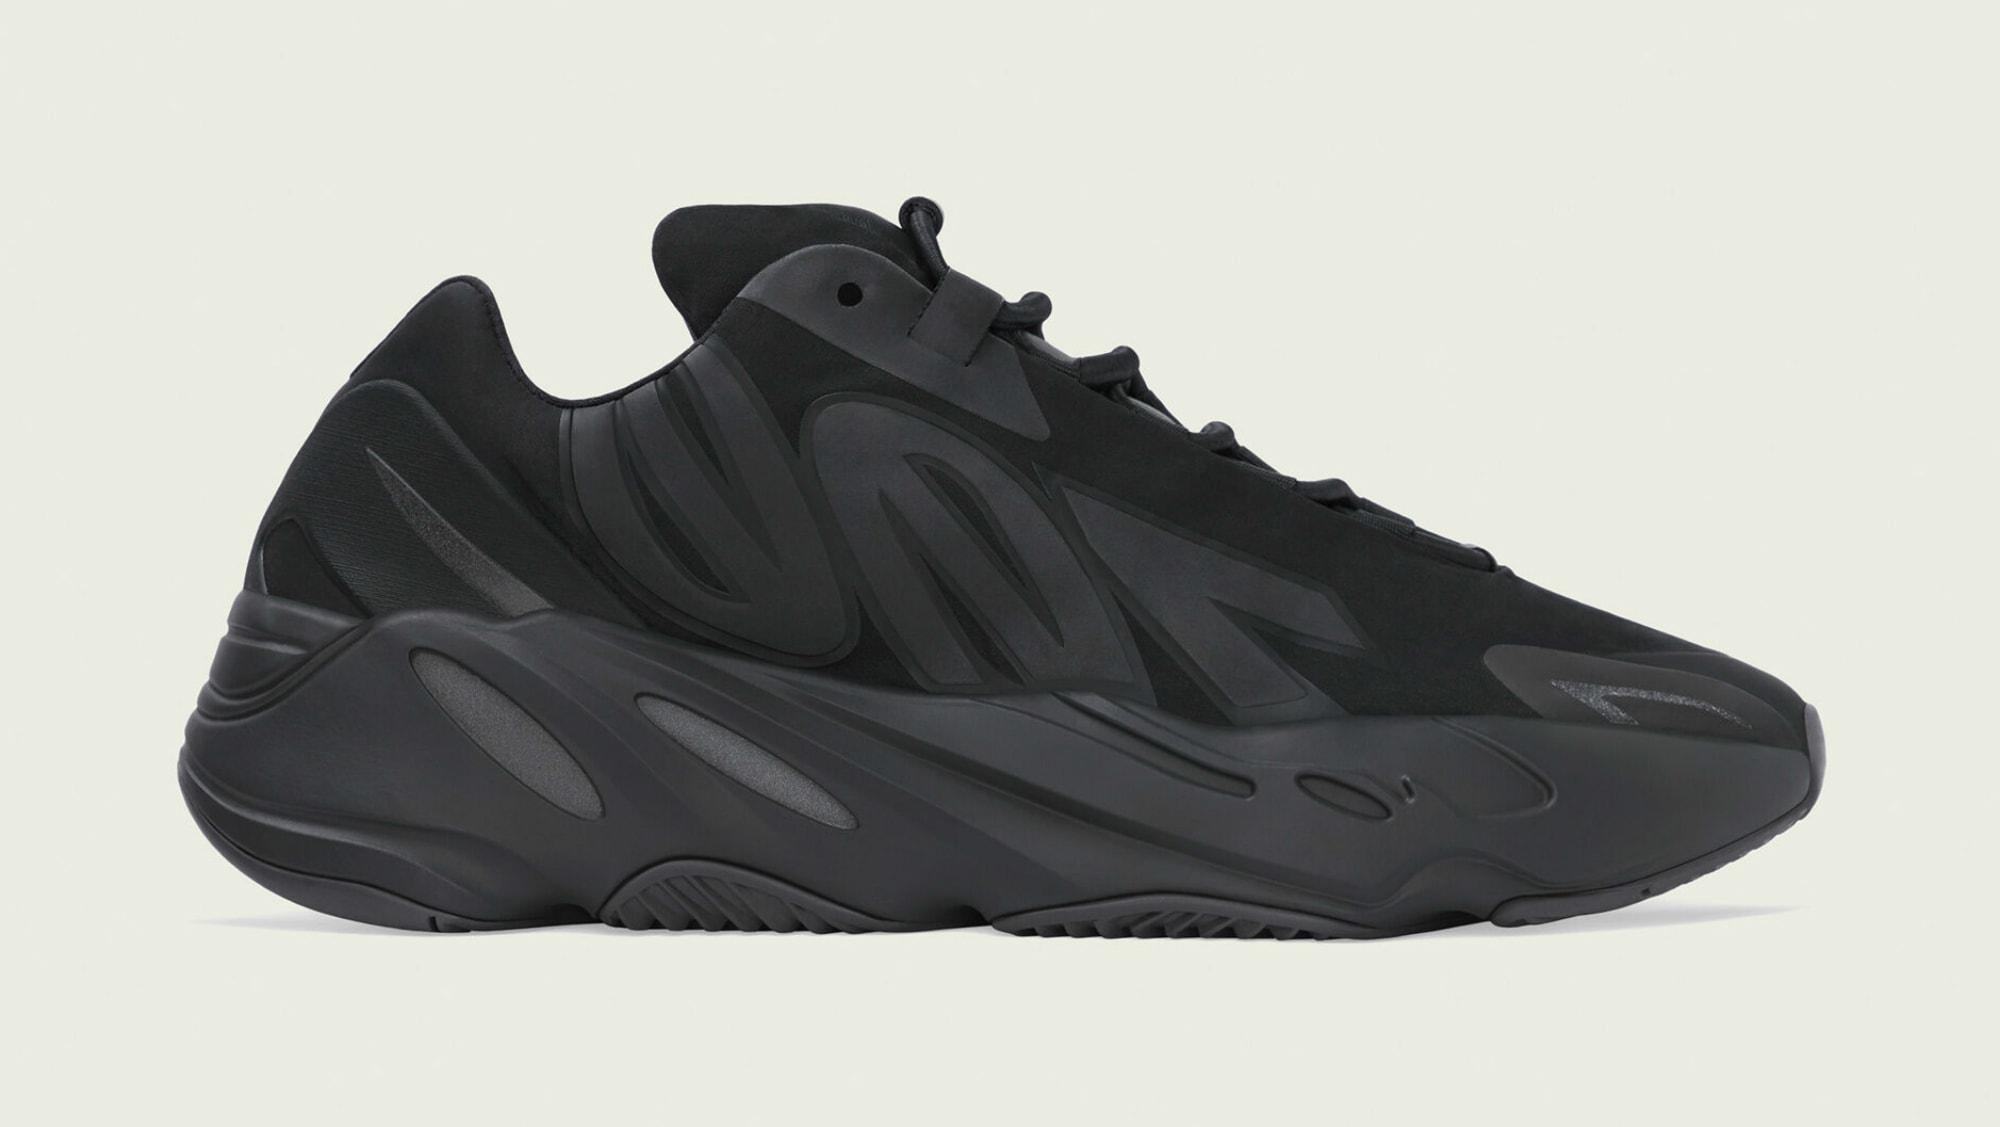 adidas-yeezy-boost-700-mnvn-black-fv4440-release-date